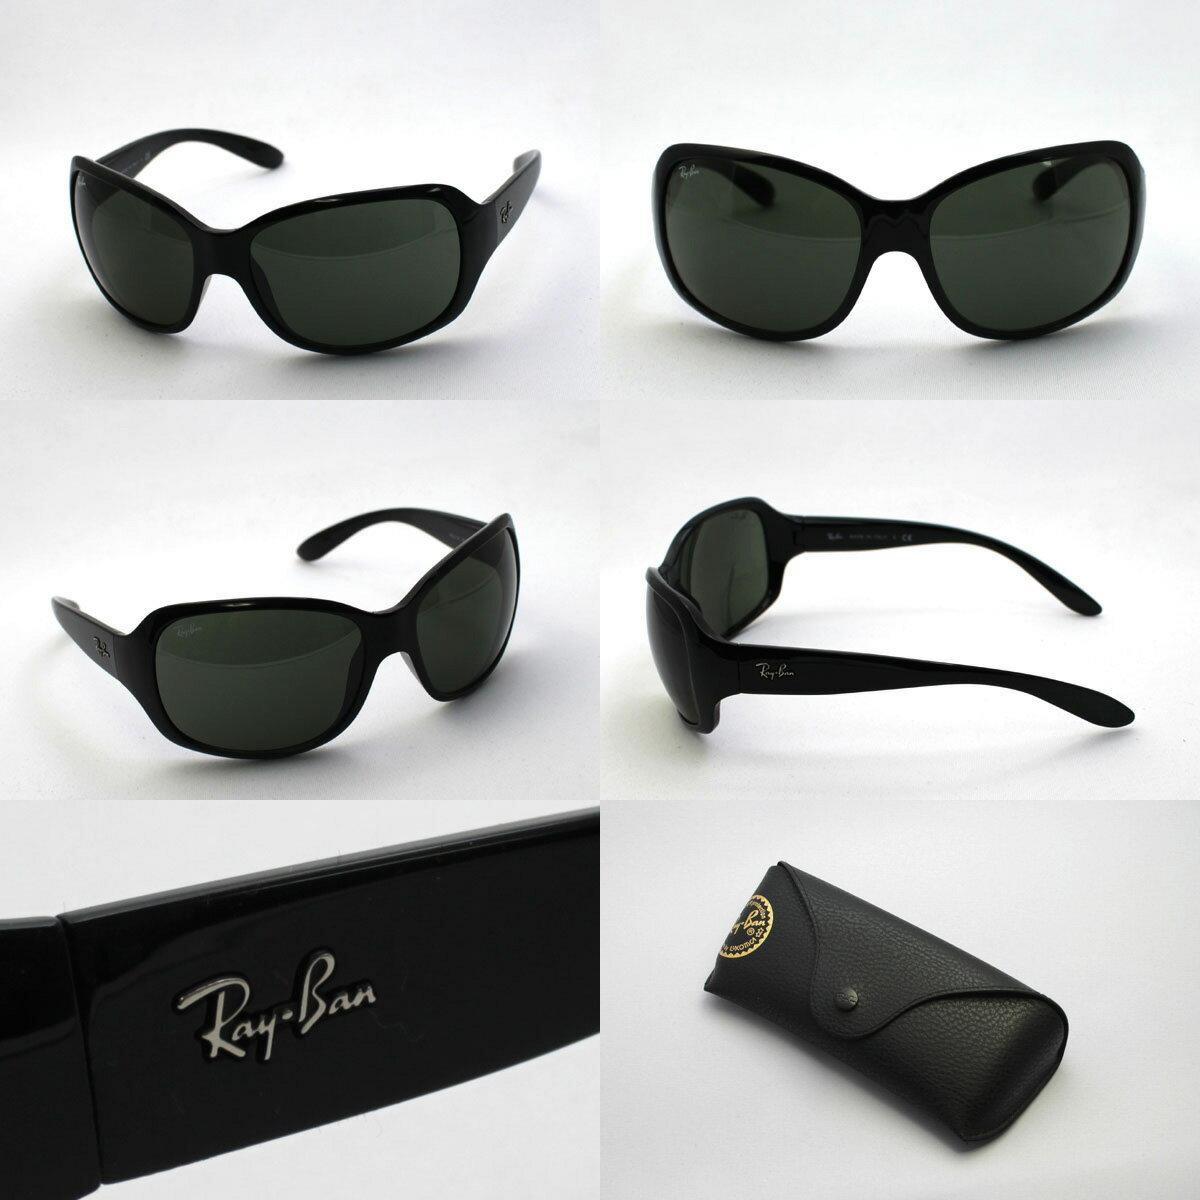 5c9d50d334 Ray Ban Rb4118 Sunglasses « Heritage Malta